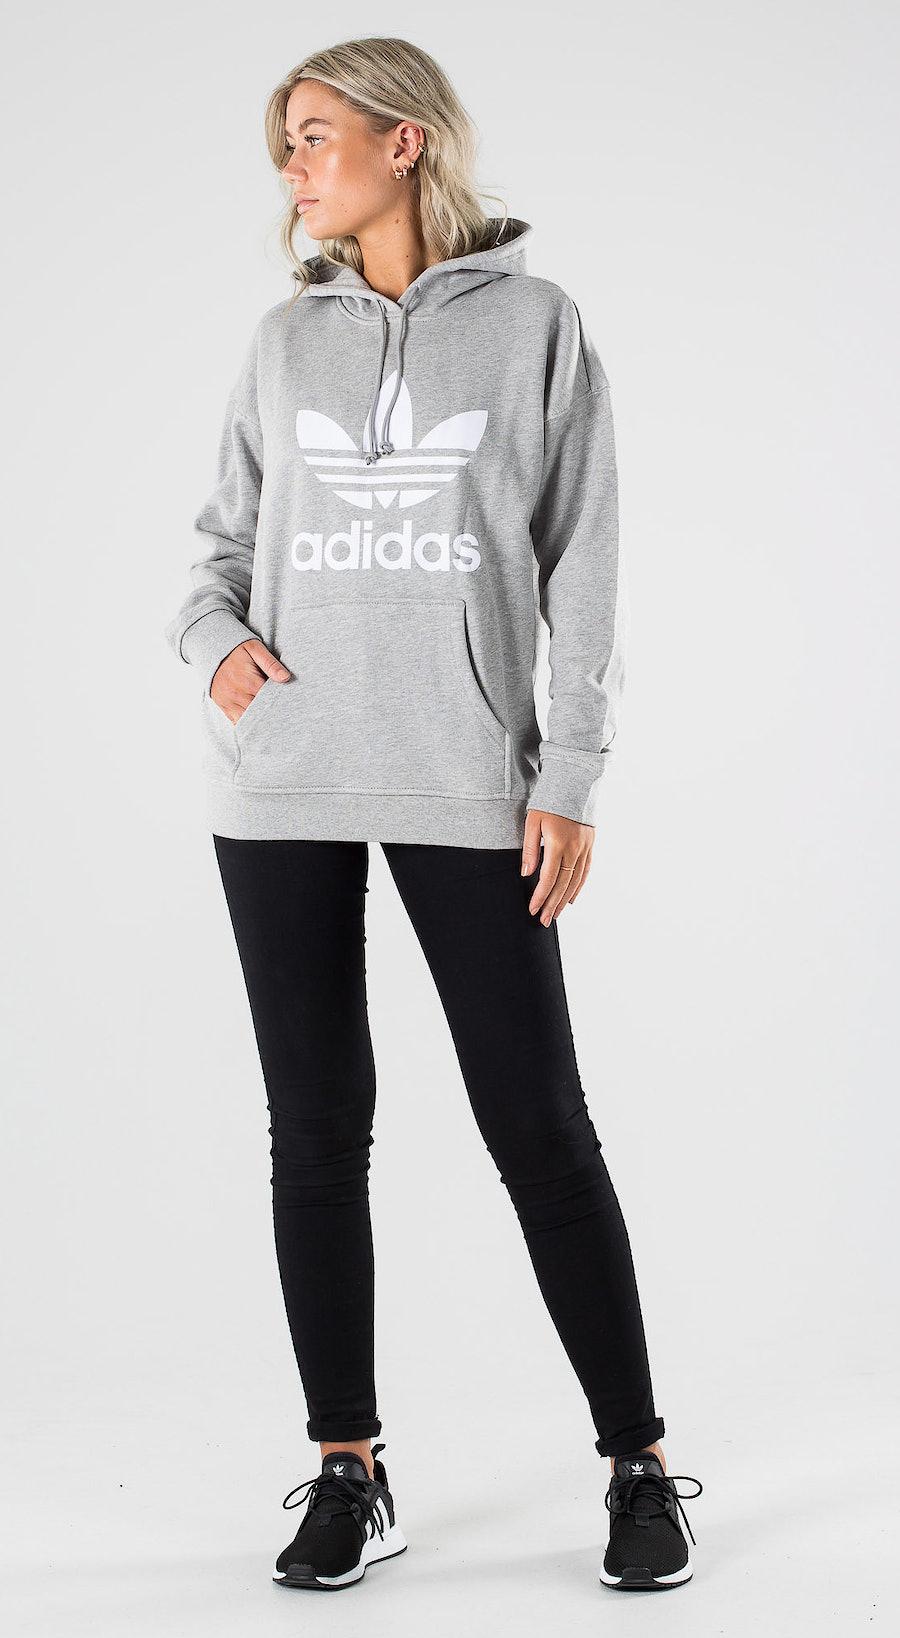 Adidas Originals Trefoil Hoodie Medium Grey Heather White Outfit Multi